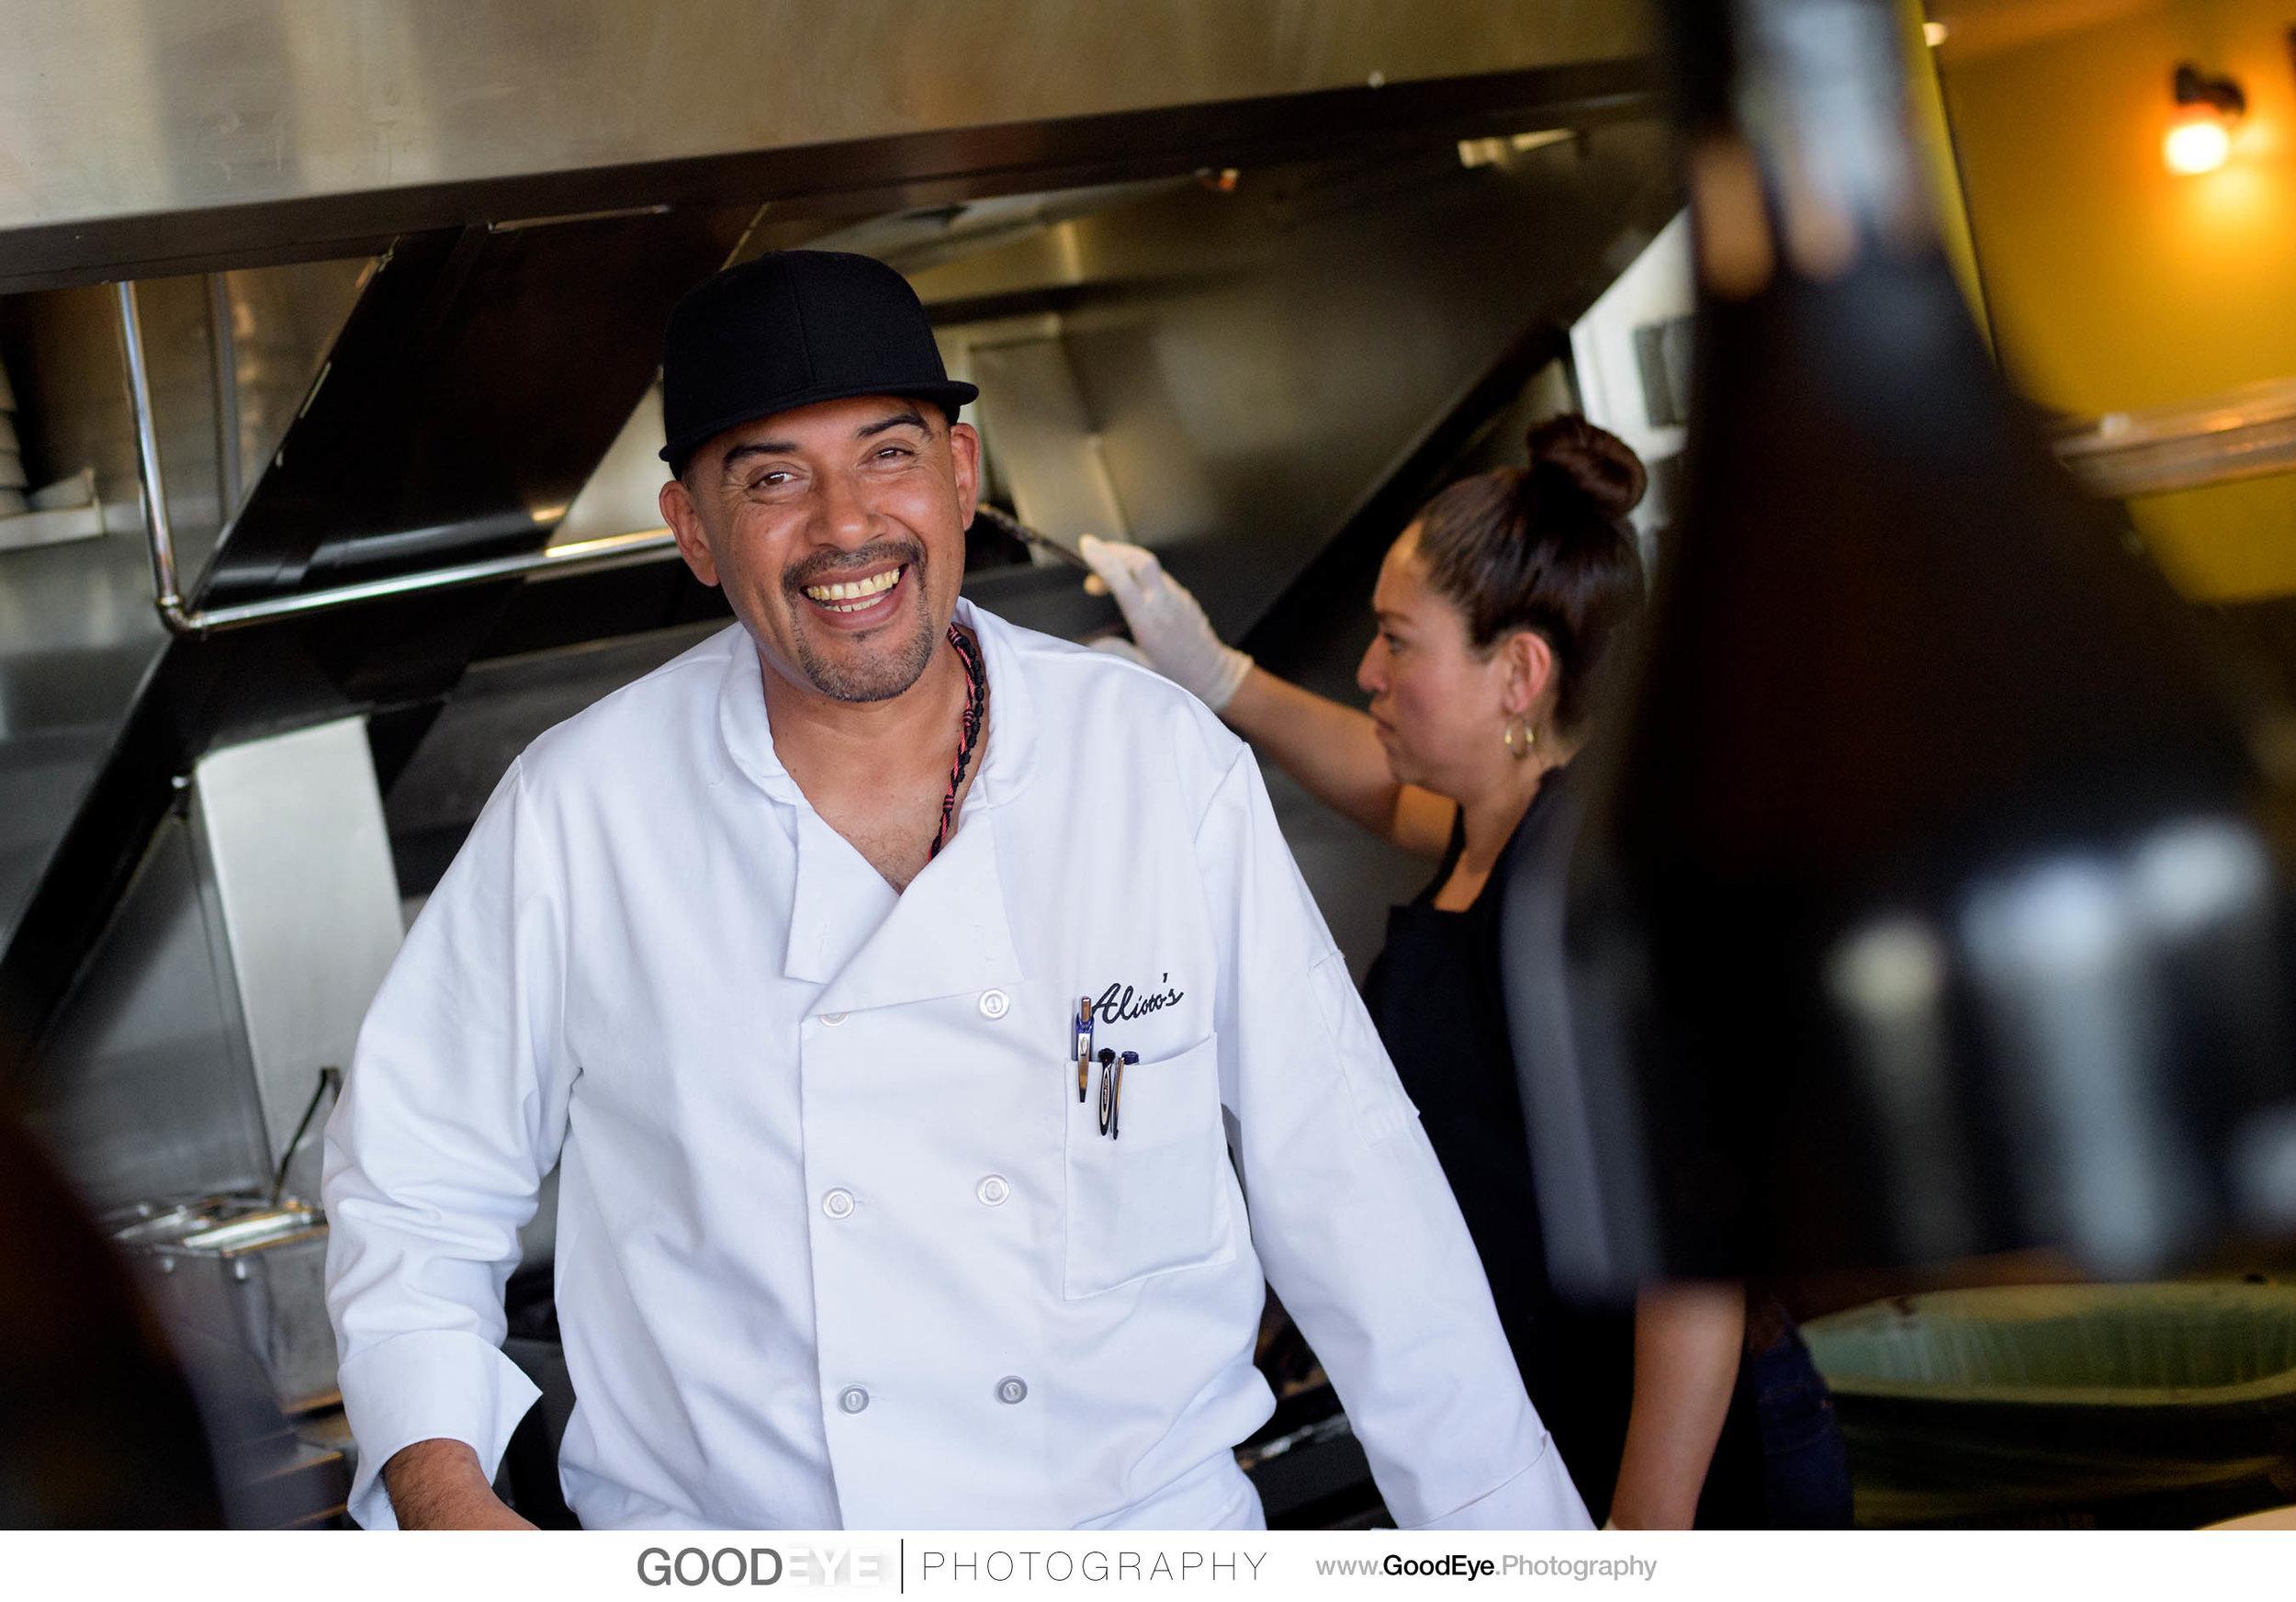 4918_Cafe_8_Aliotos_San_Francisco_Food_Photography_web.jpg